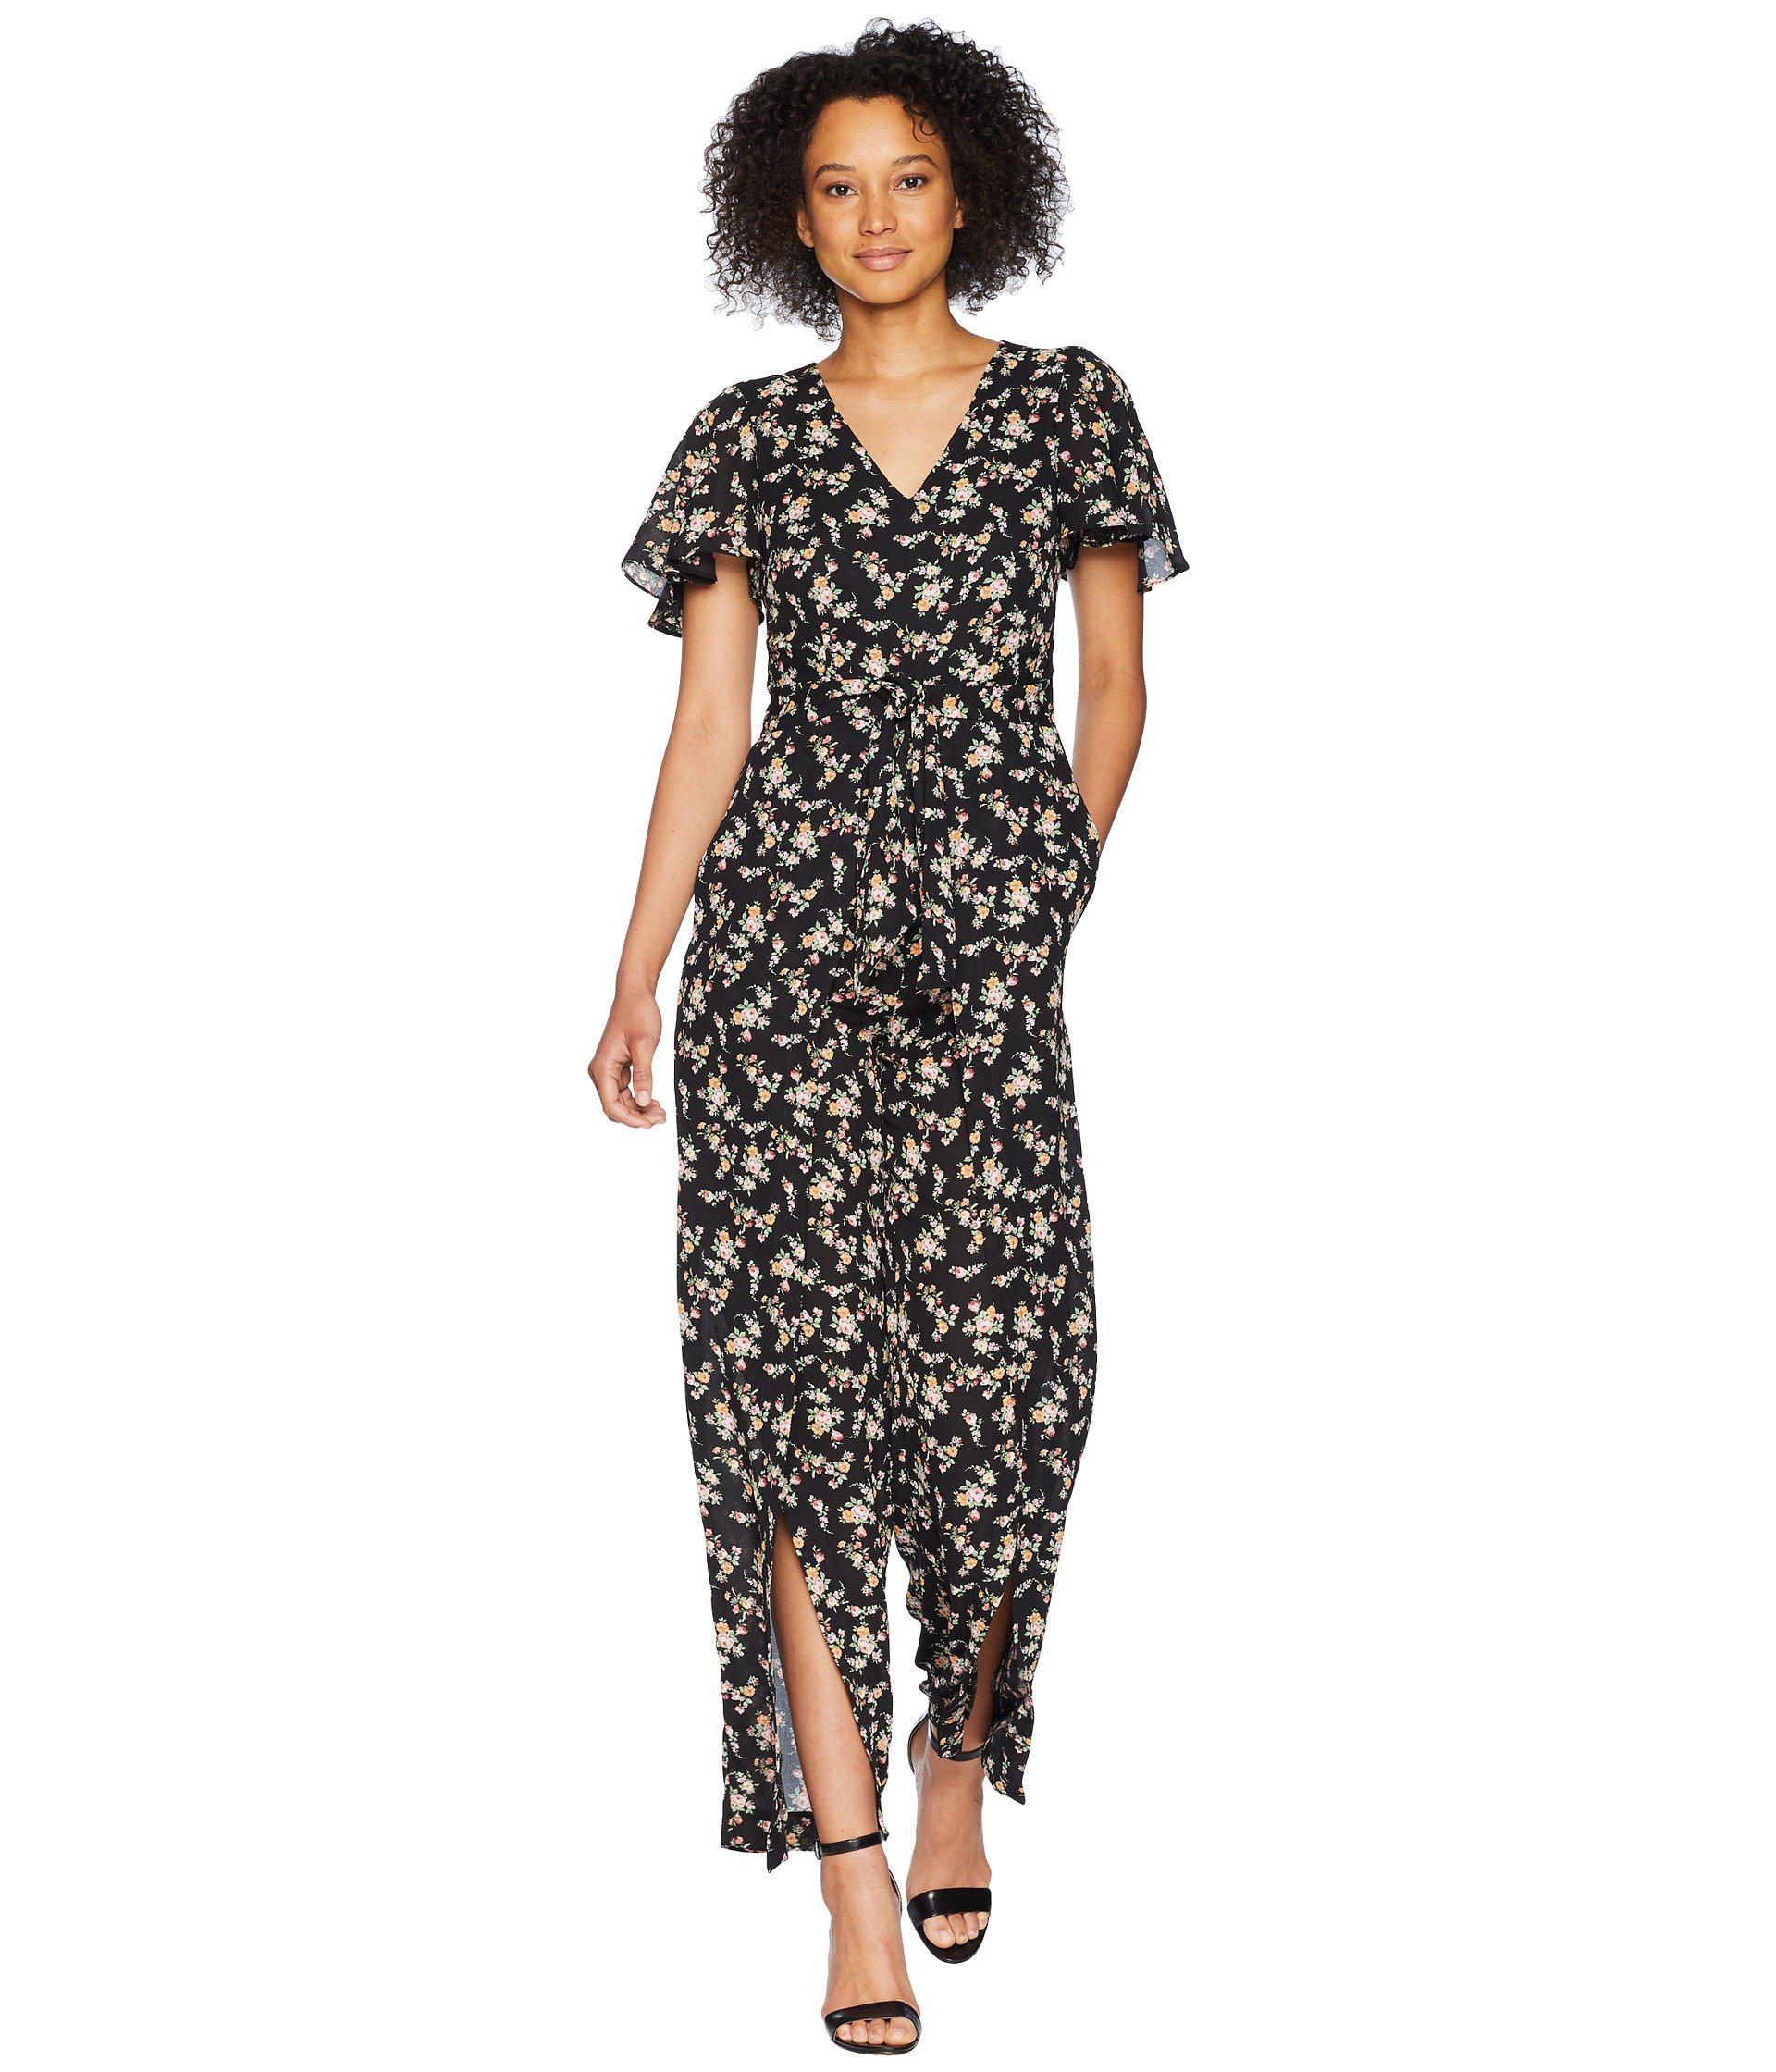 0a32cd6d1be5 Lyst - Tahari Split Leg Floral Tie Front Jumpsuit in Black - Save 38%